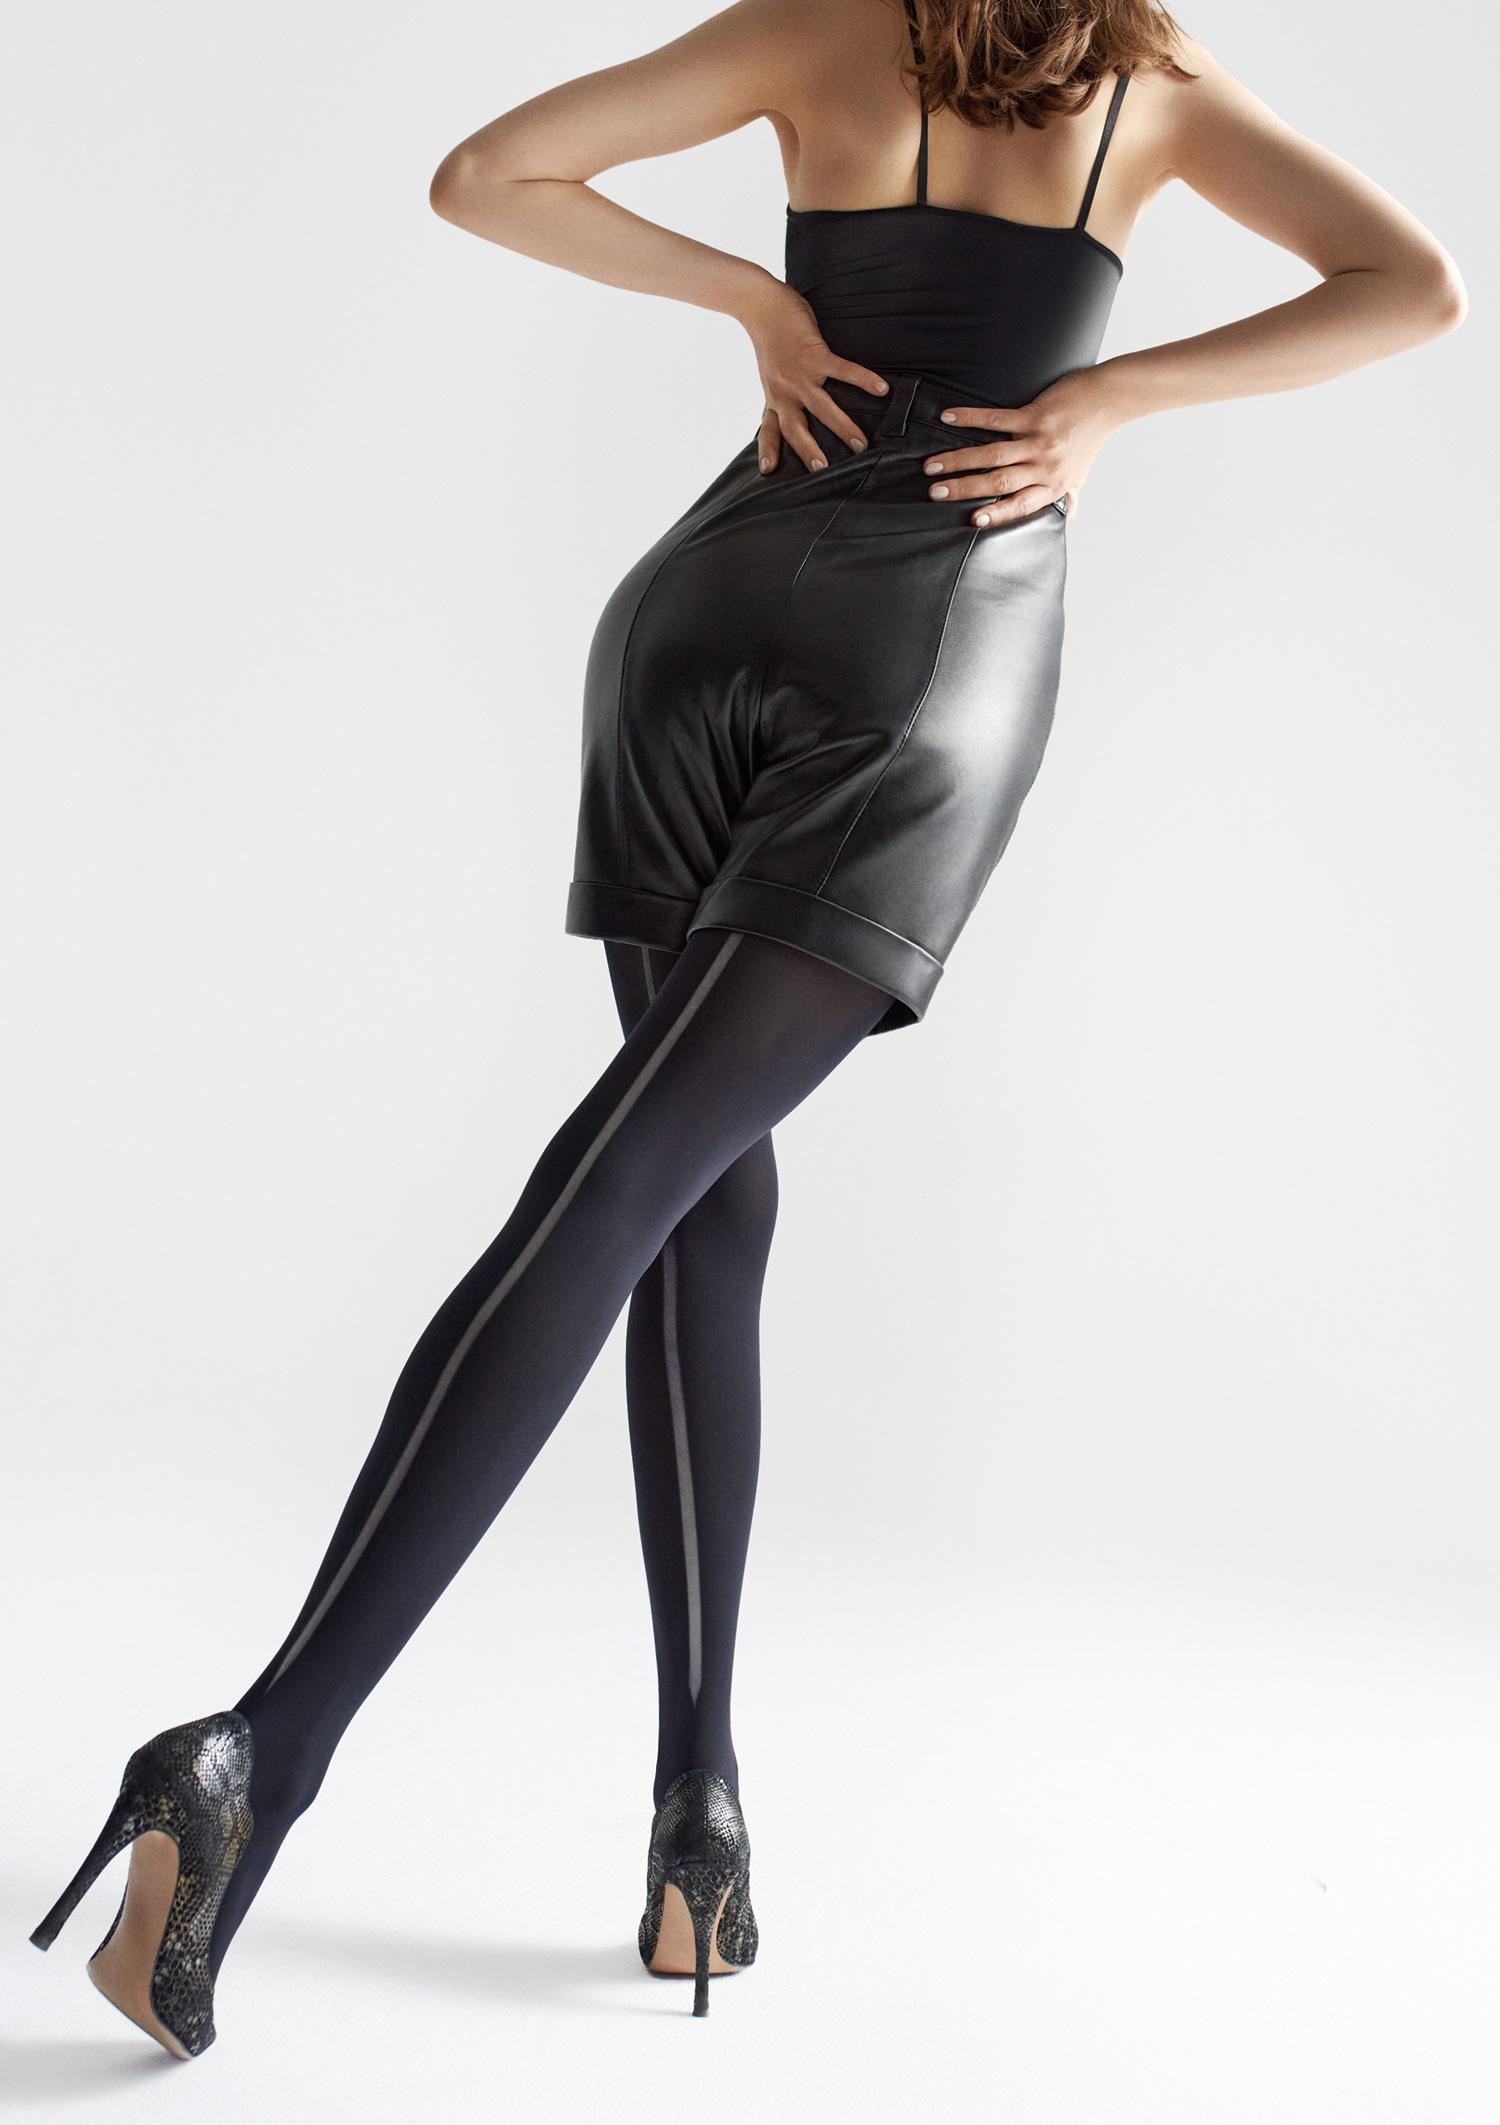 https://golden-legs.com.ua/images/stories/virtuemart/product/kryjace-rajstopy-z-ozdobnym-paskiem-z-tylu-allure-w08-marilyn_1.jpg